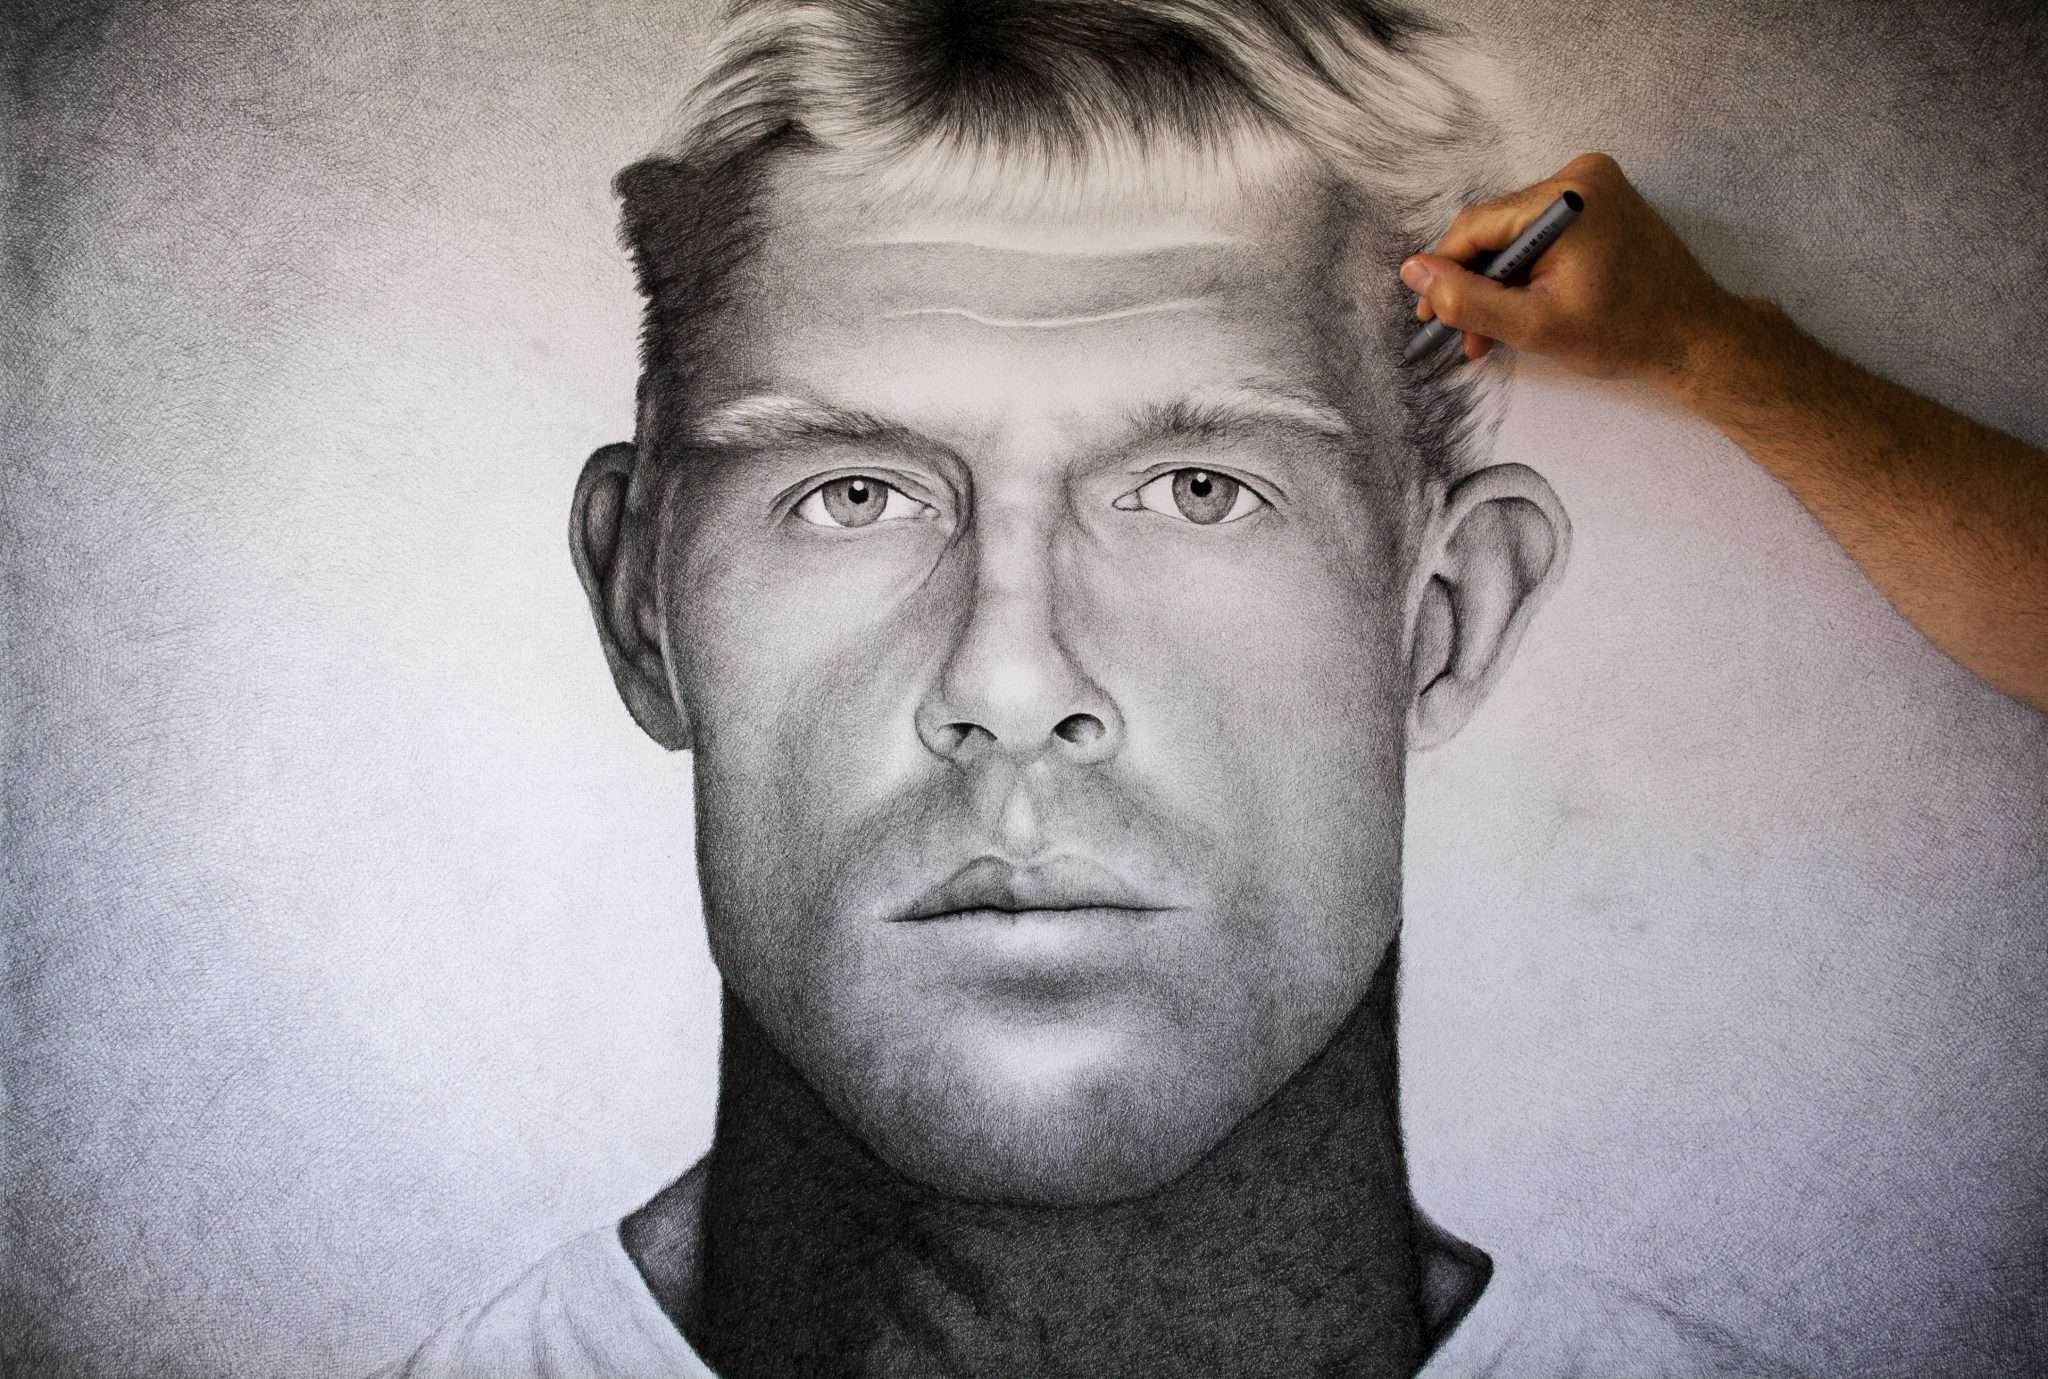 Mick Fanning crosshatching portrait by artist Dean Spinks